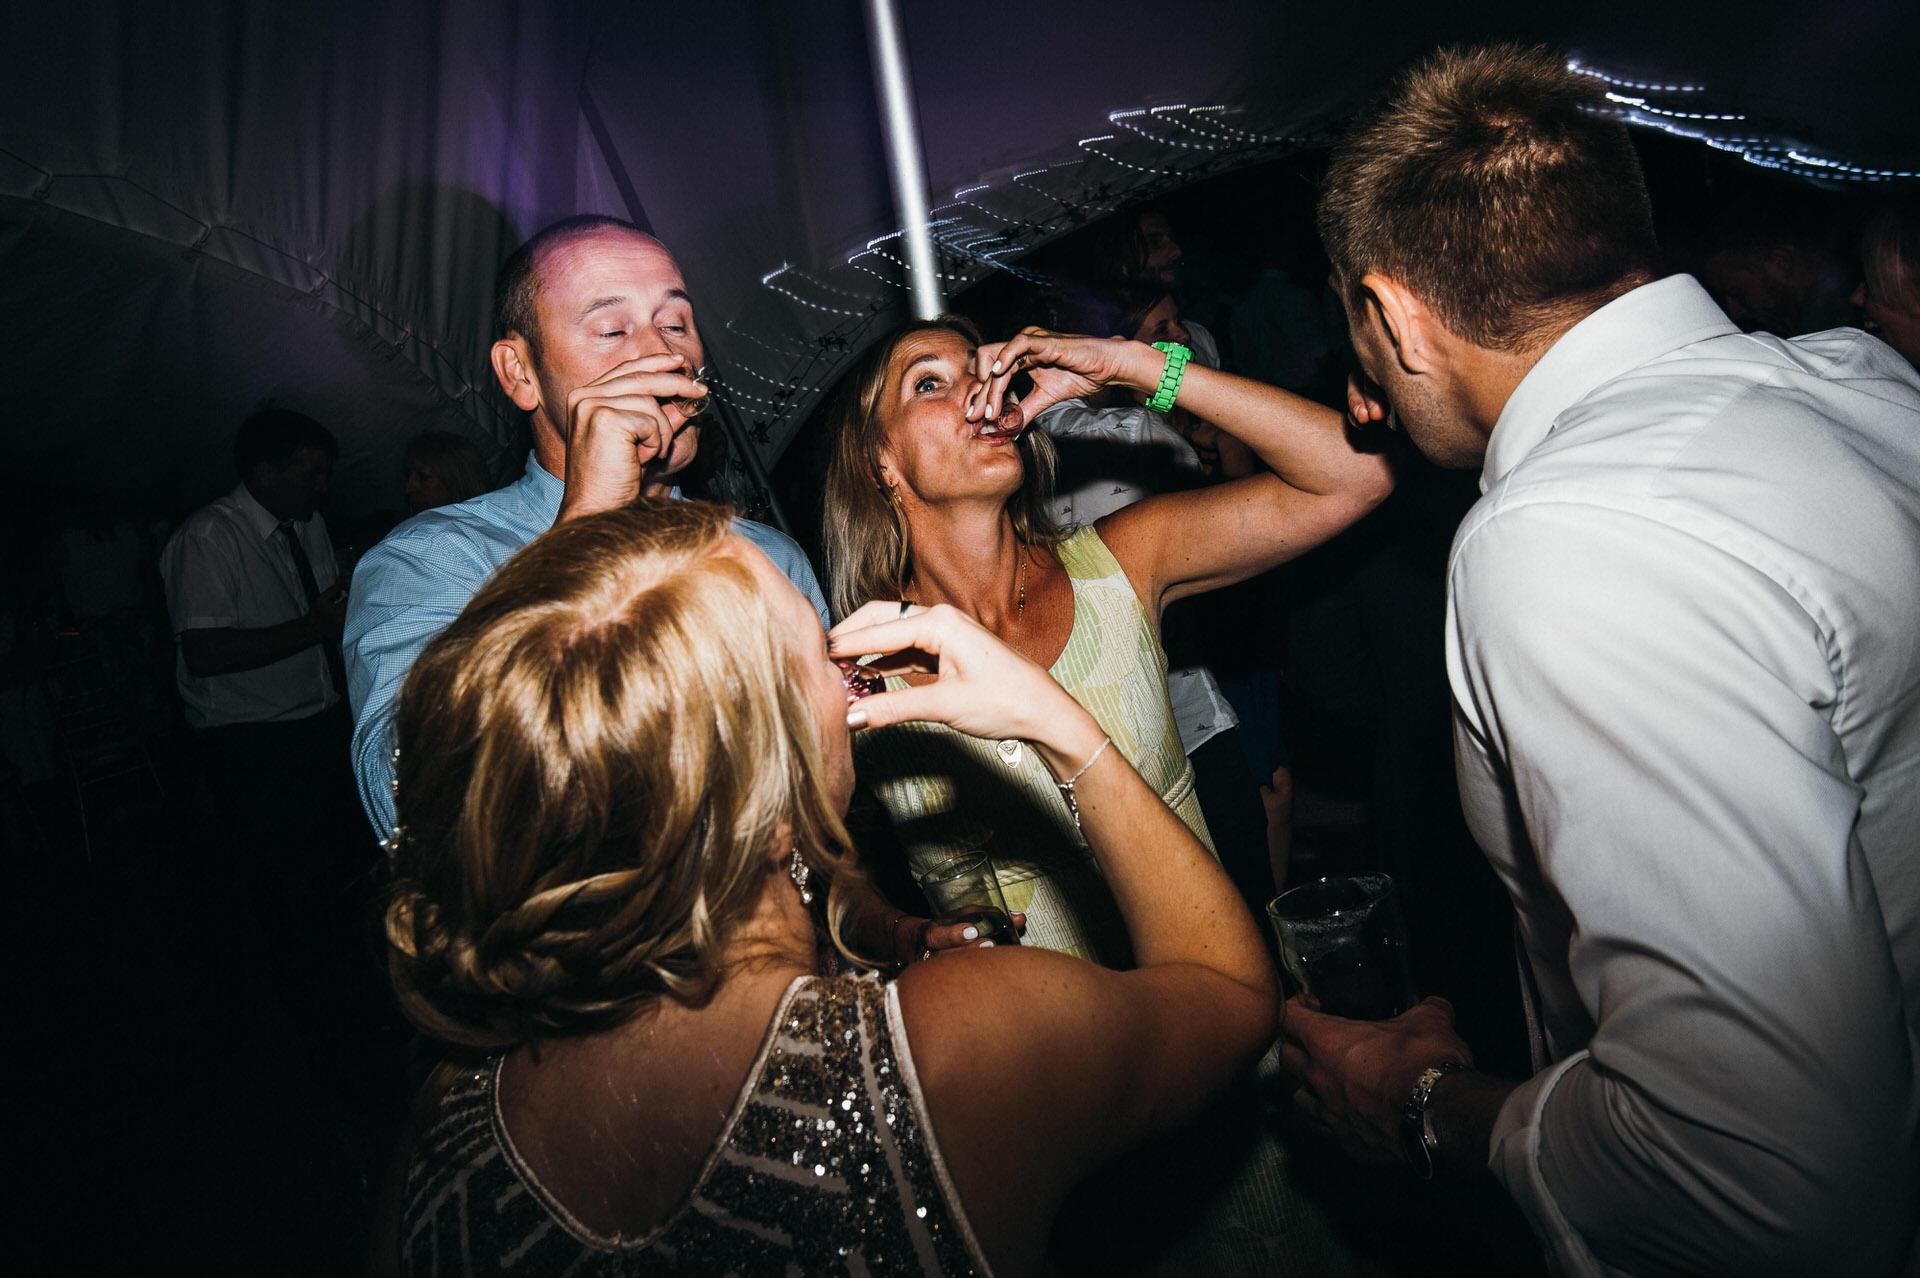 wedding dancing RHS Wisely